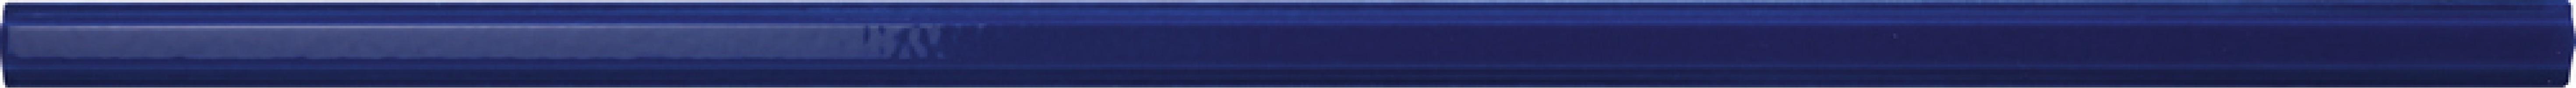 Бордюр Cristall Matita Blu 2x60 Alta Ceramica